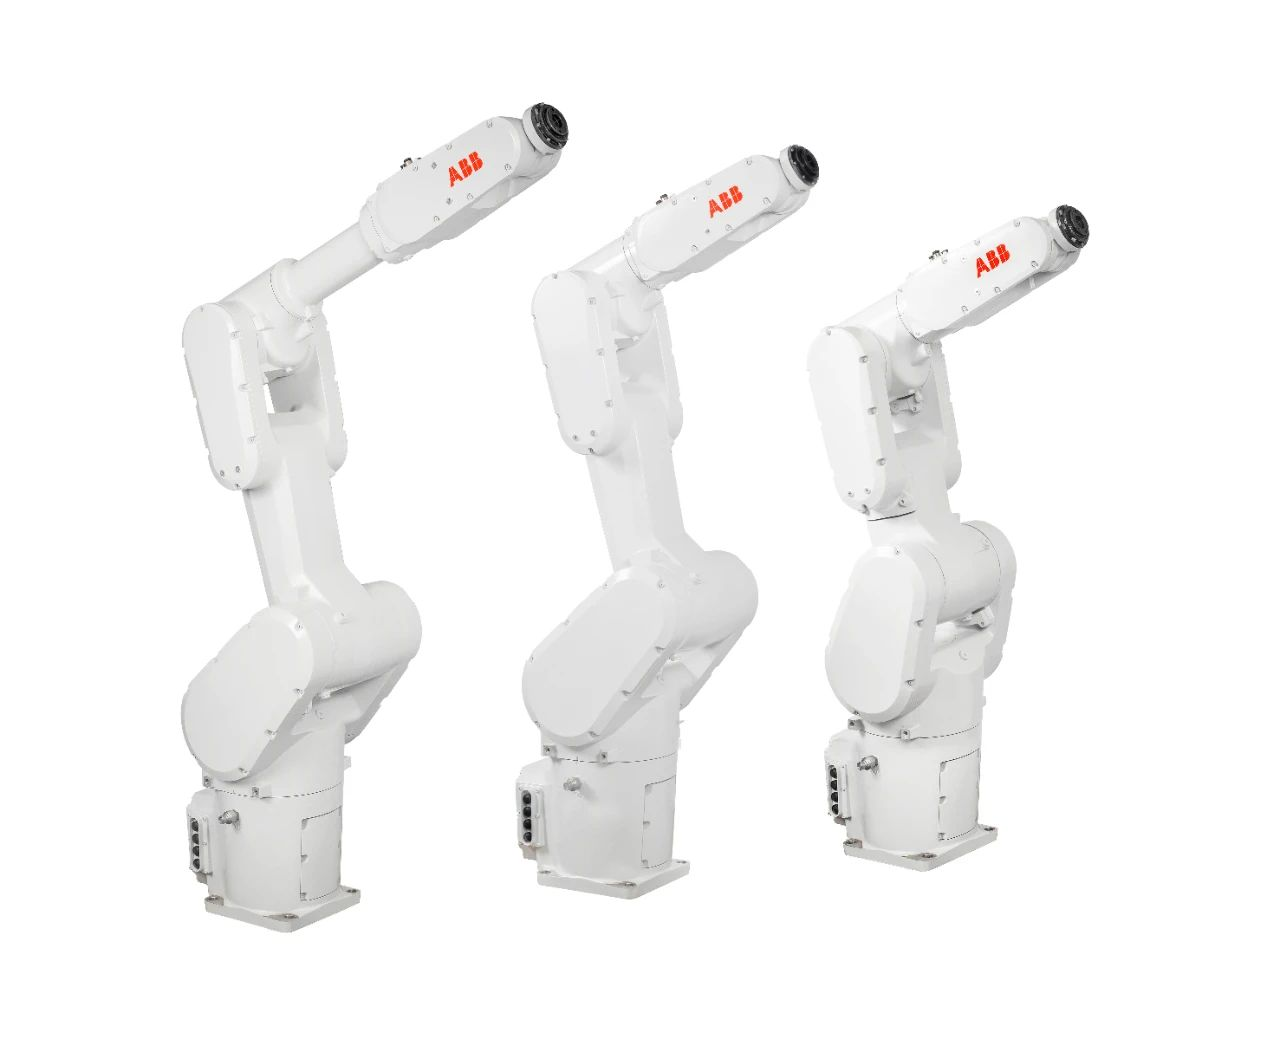 ABB工业机器人 全新小型机器人 上下料 装配 搬运 IRB 1200